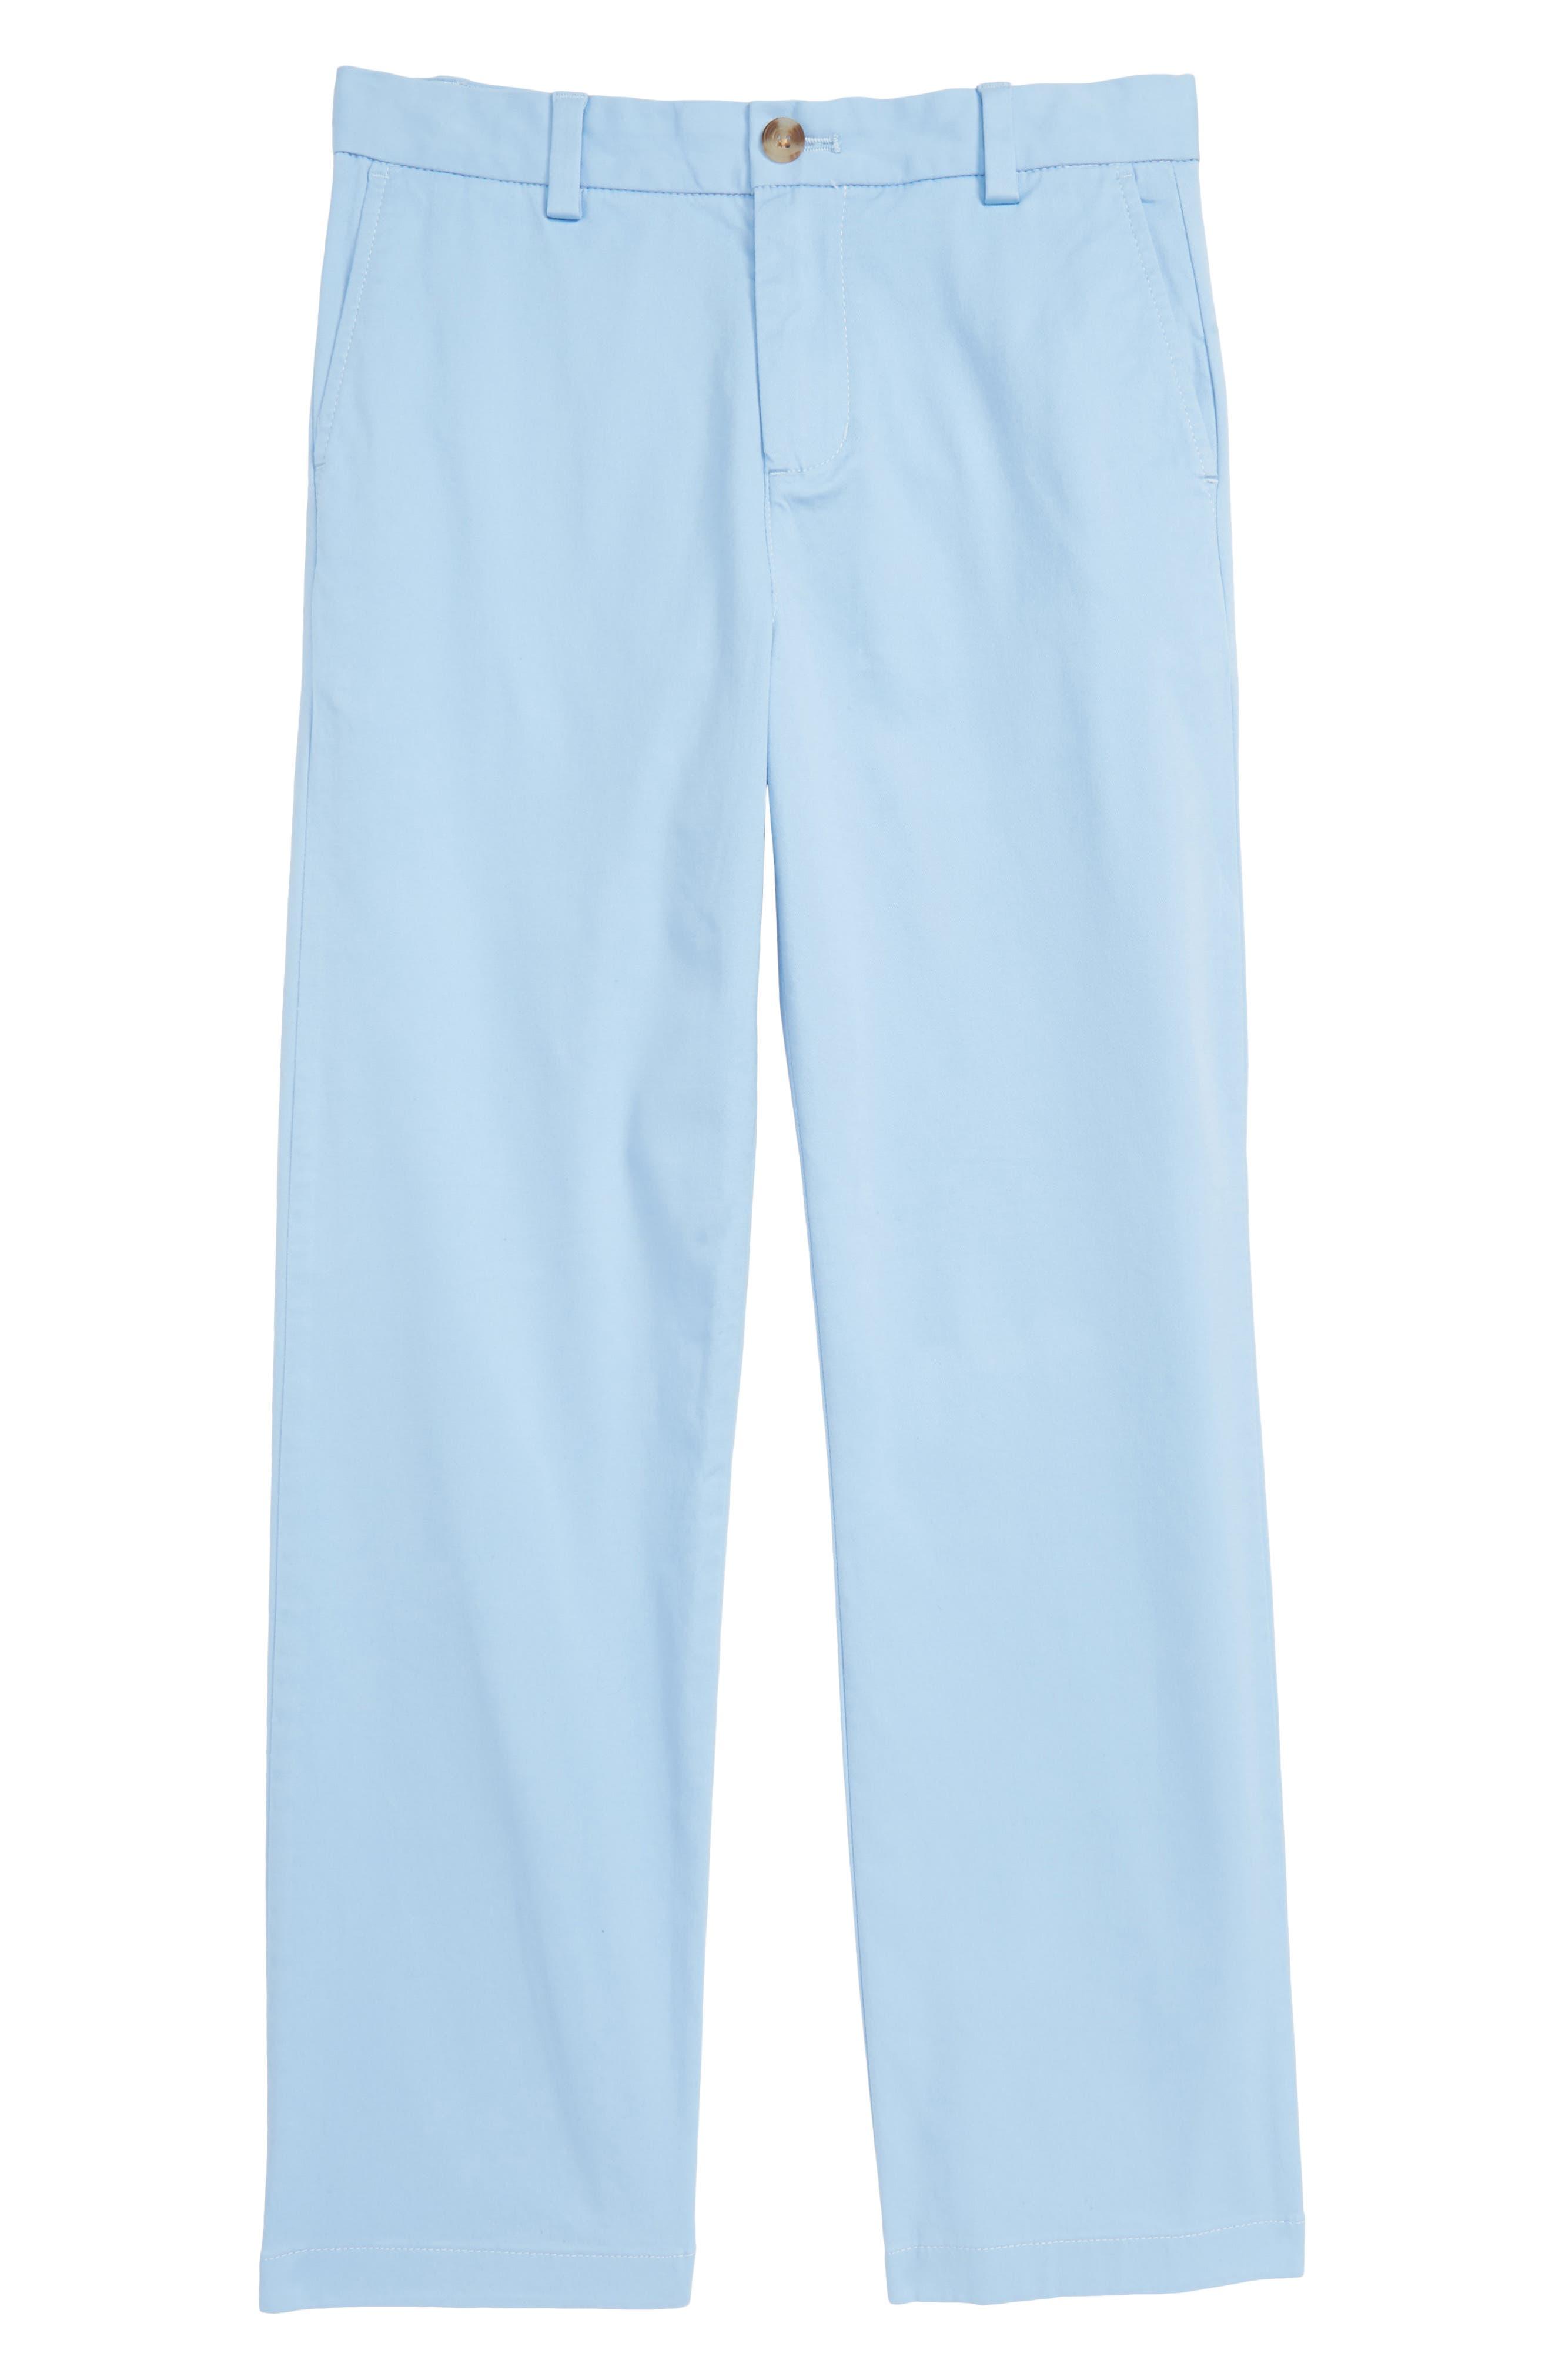 VINEYARD VINES,                             Stretch Breaker Pants,                             Main thumbnail 1, color,                             456